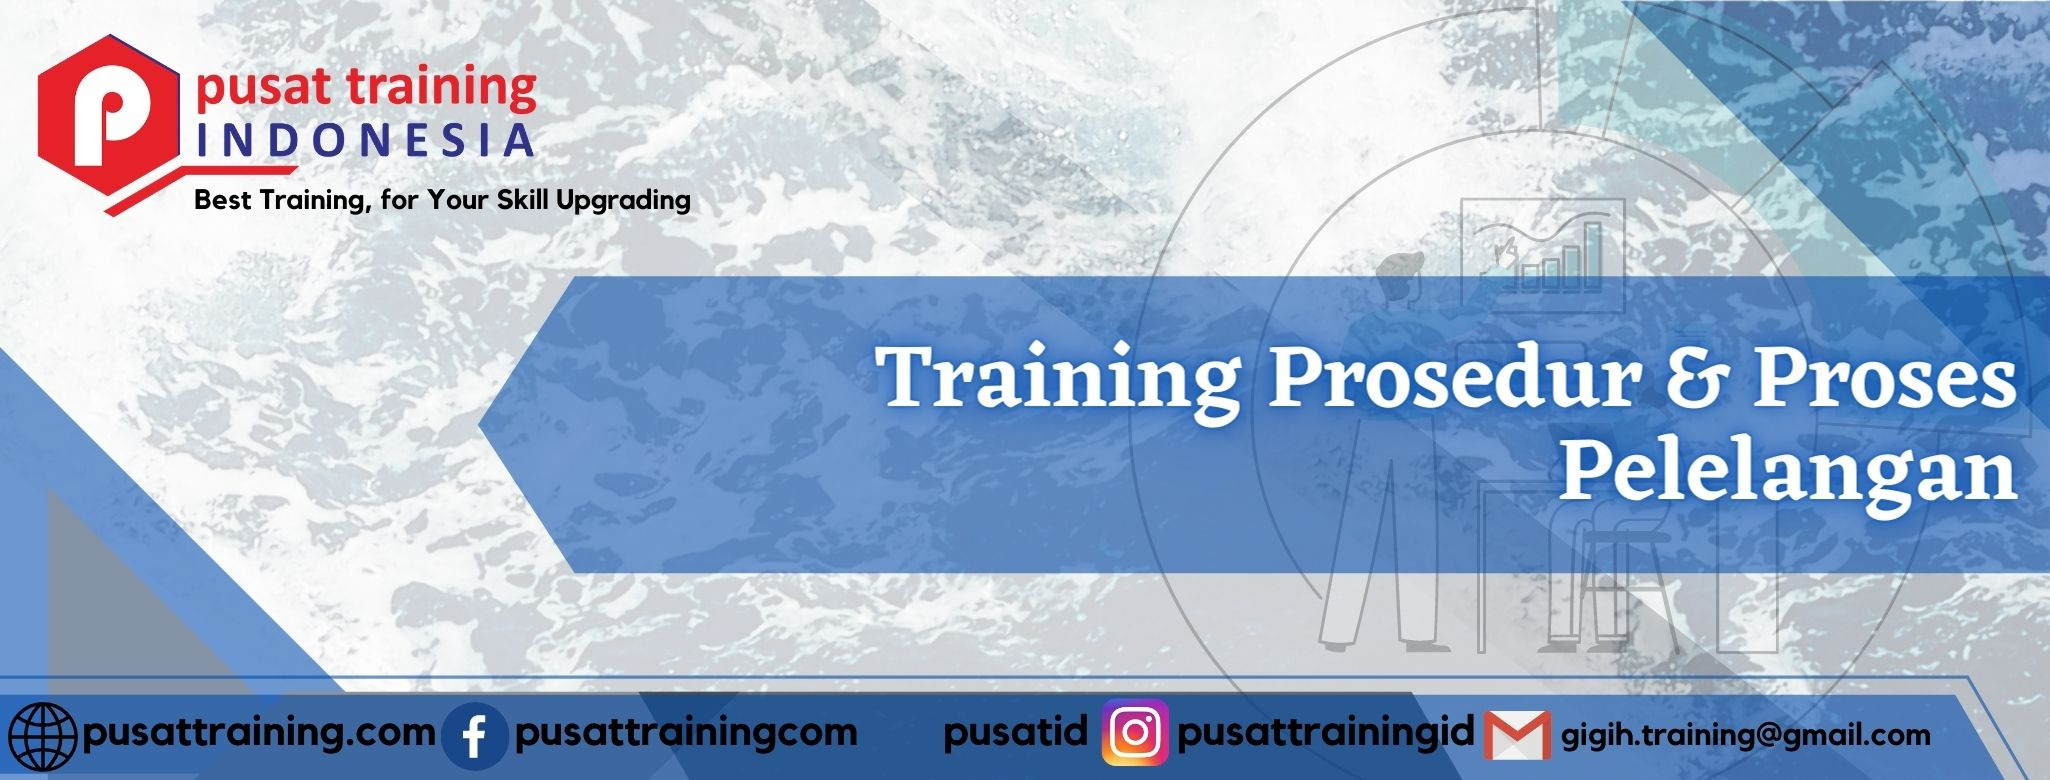 Training-Prosedur-Proses-Pelelangan